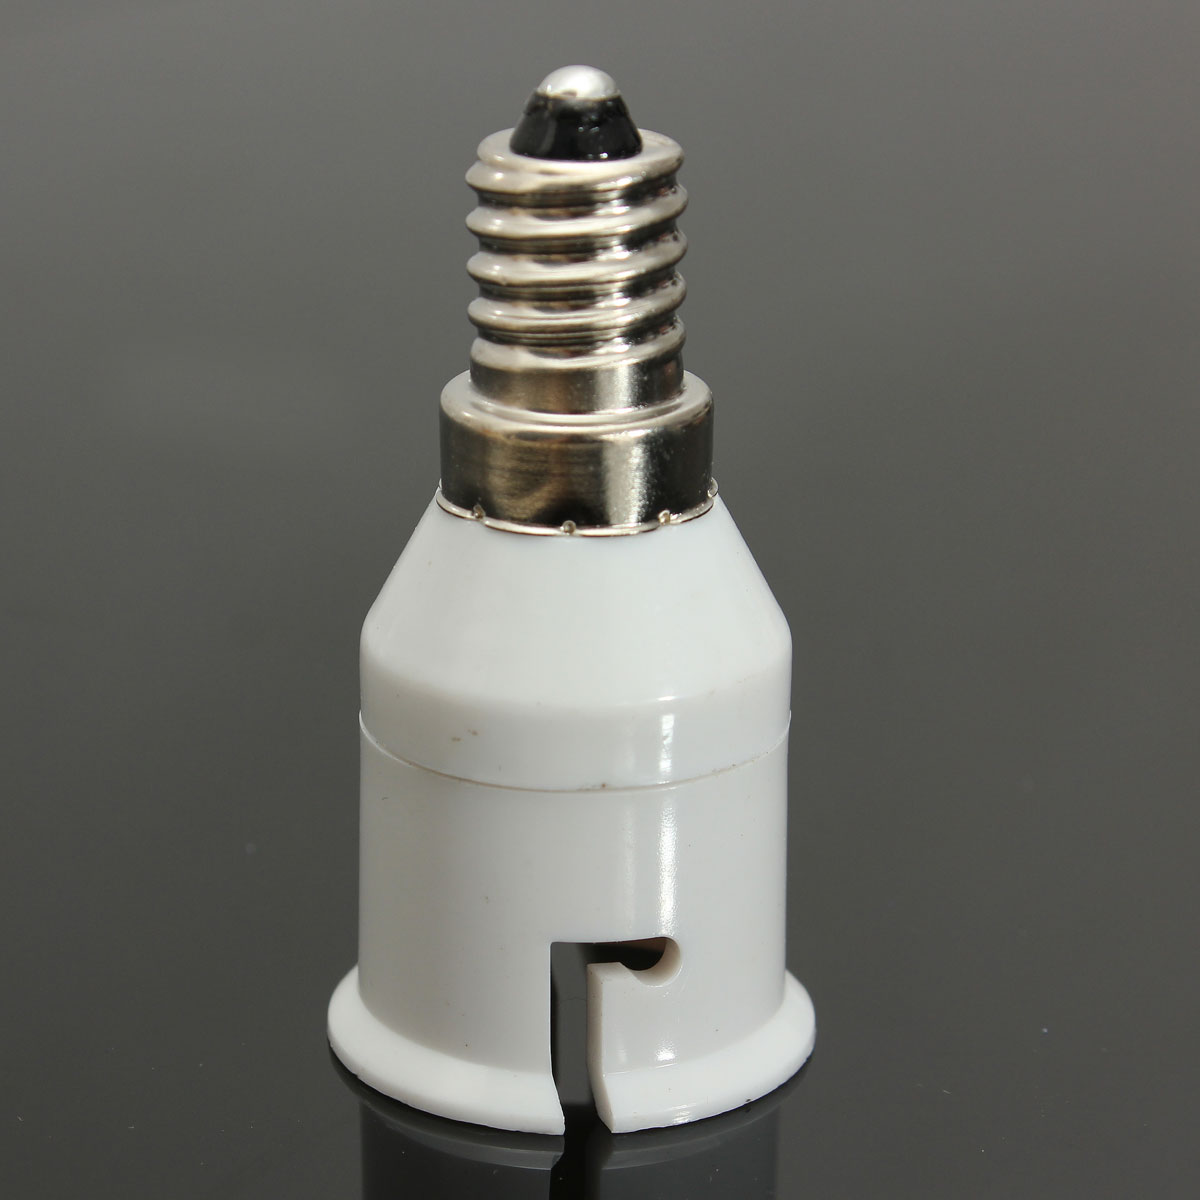 bayonet bulb socket converter bulb socket small screw e14. Black Bedroom Furniture Sets. Home Design Ideas